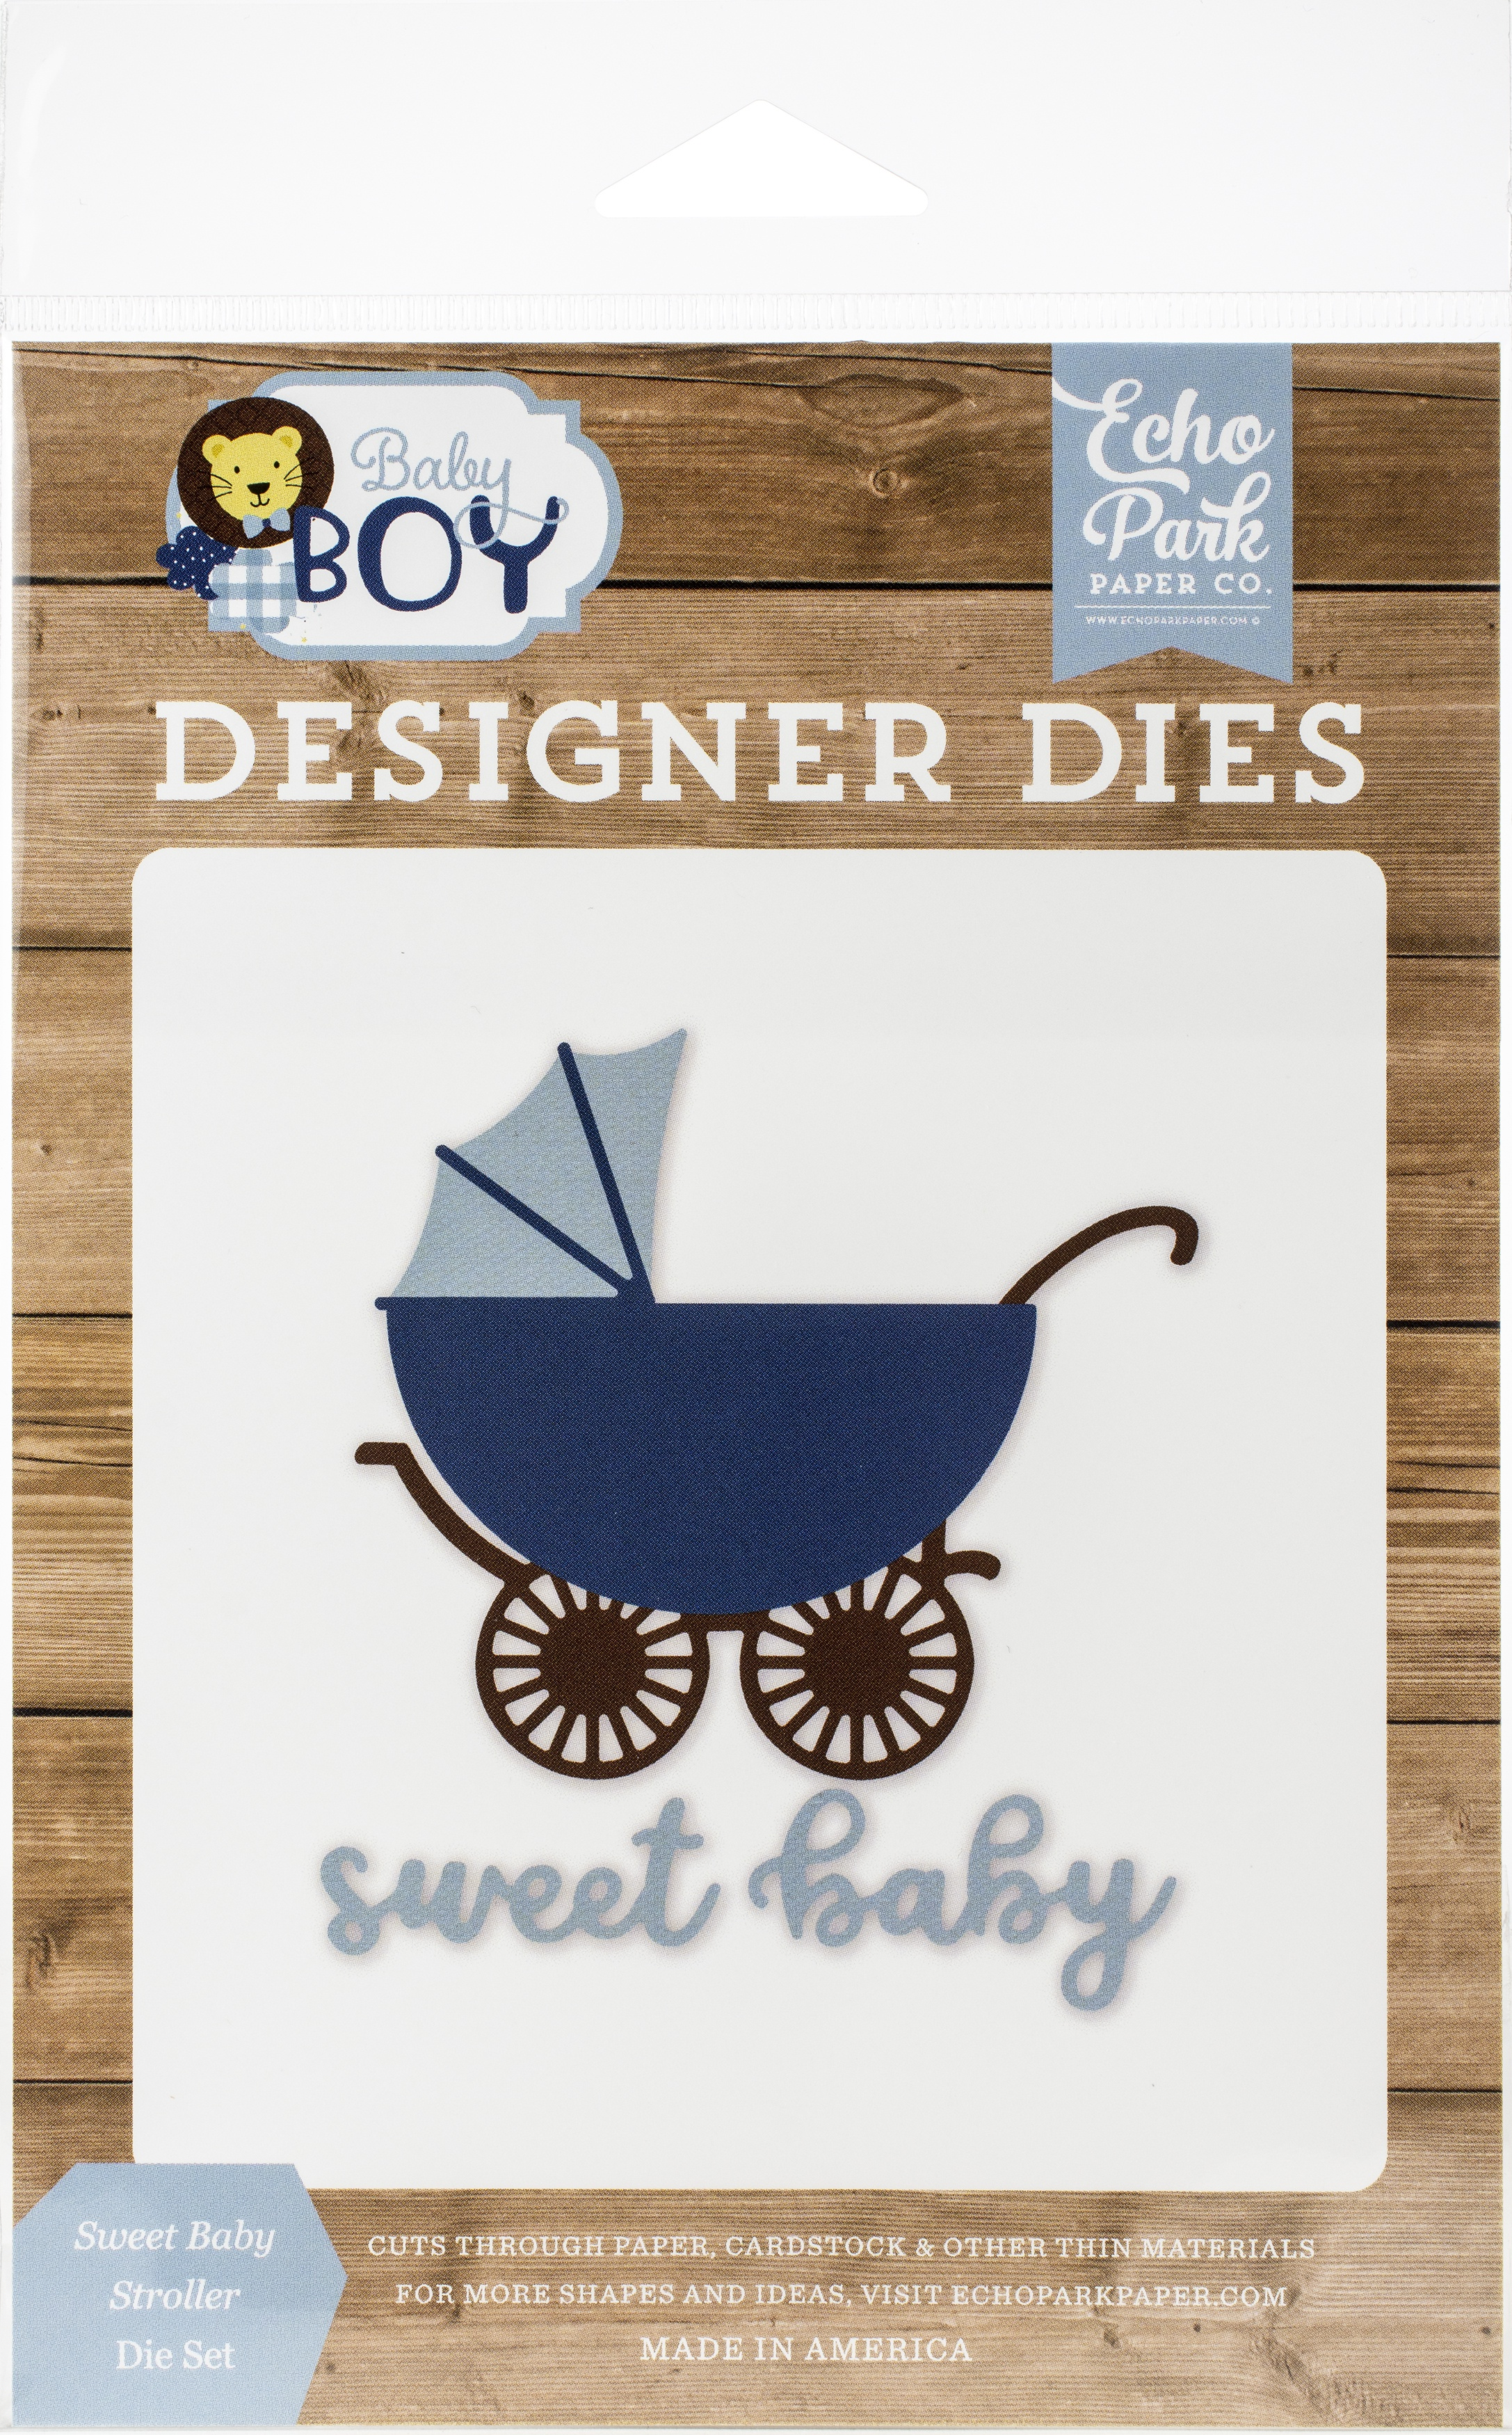 Echo Park Dies-Sweet Baby Stroller, Baby Boy